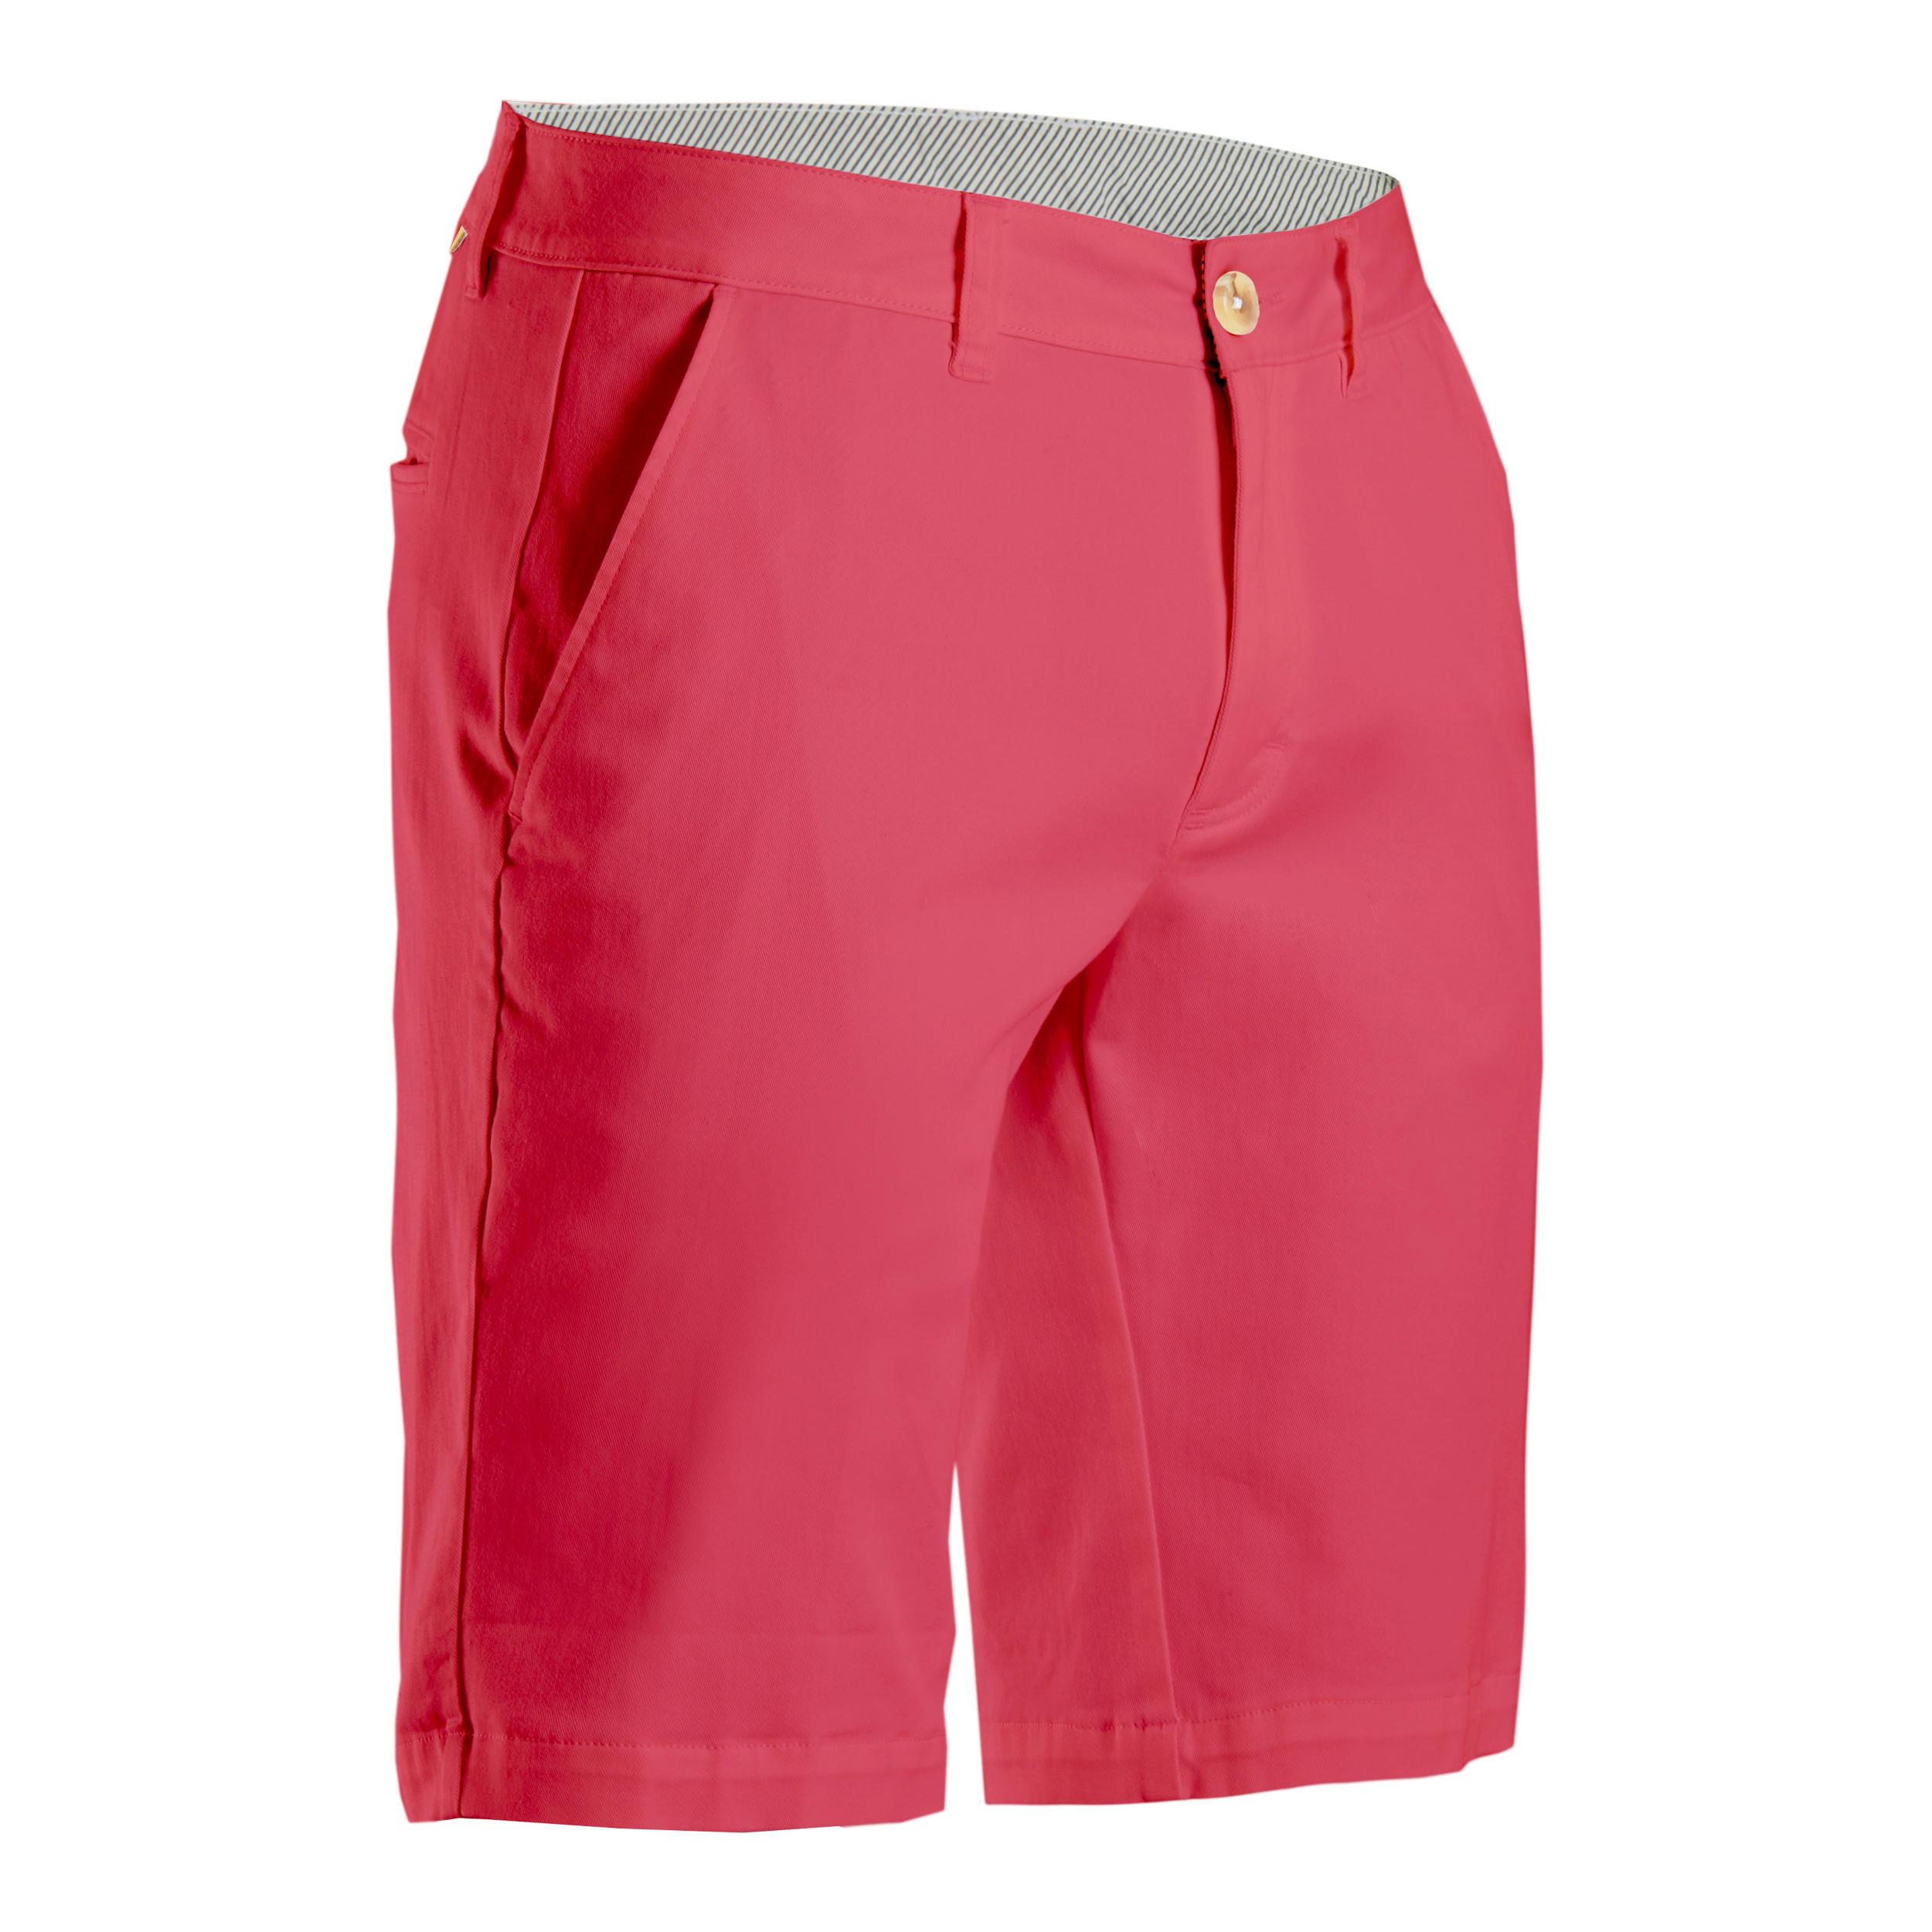 Bermude Golf Roz Bărbați imagine